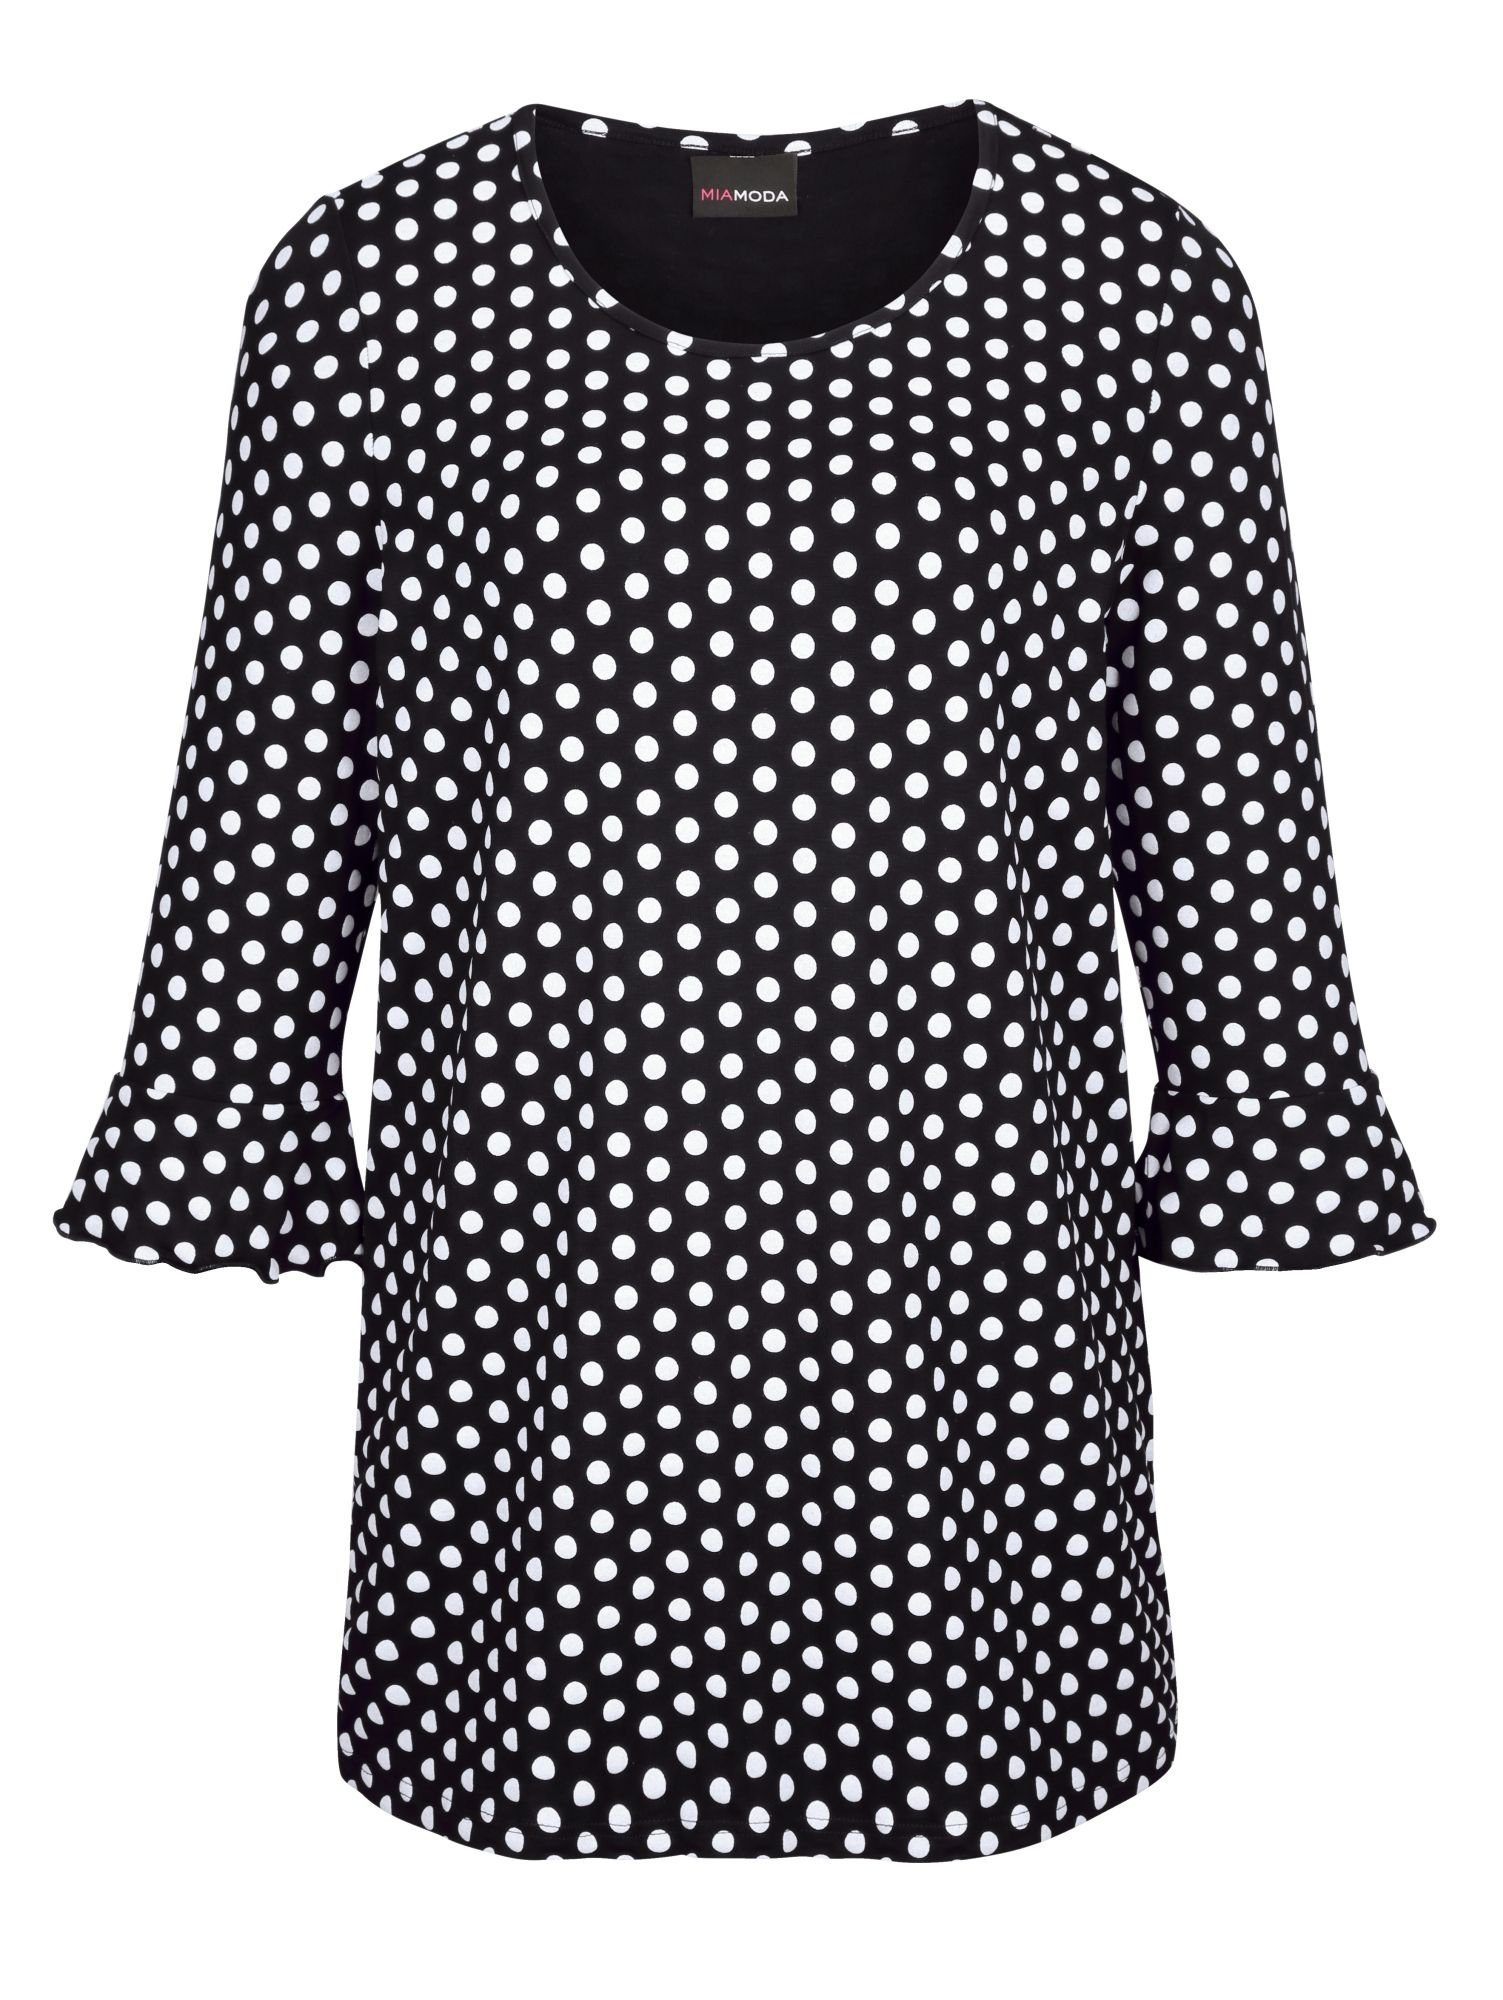 MIAMODA Longshirt mit hübschem Pünktchendruck-Muster | Bekleidung > Shirts > Longshirts | Schwarz | Viskose | Miamoda